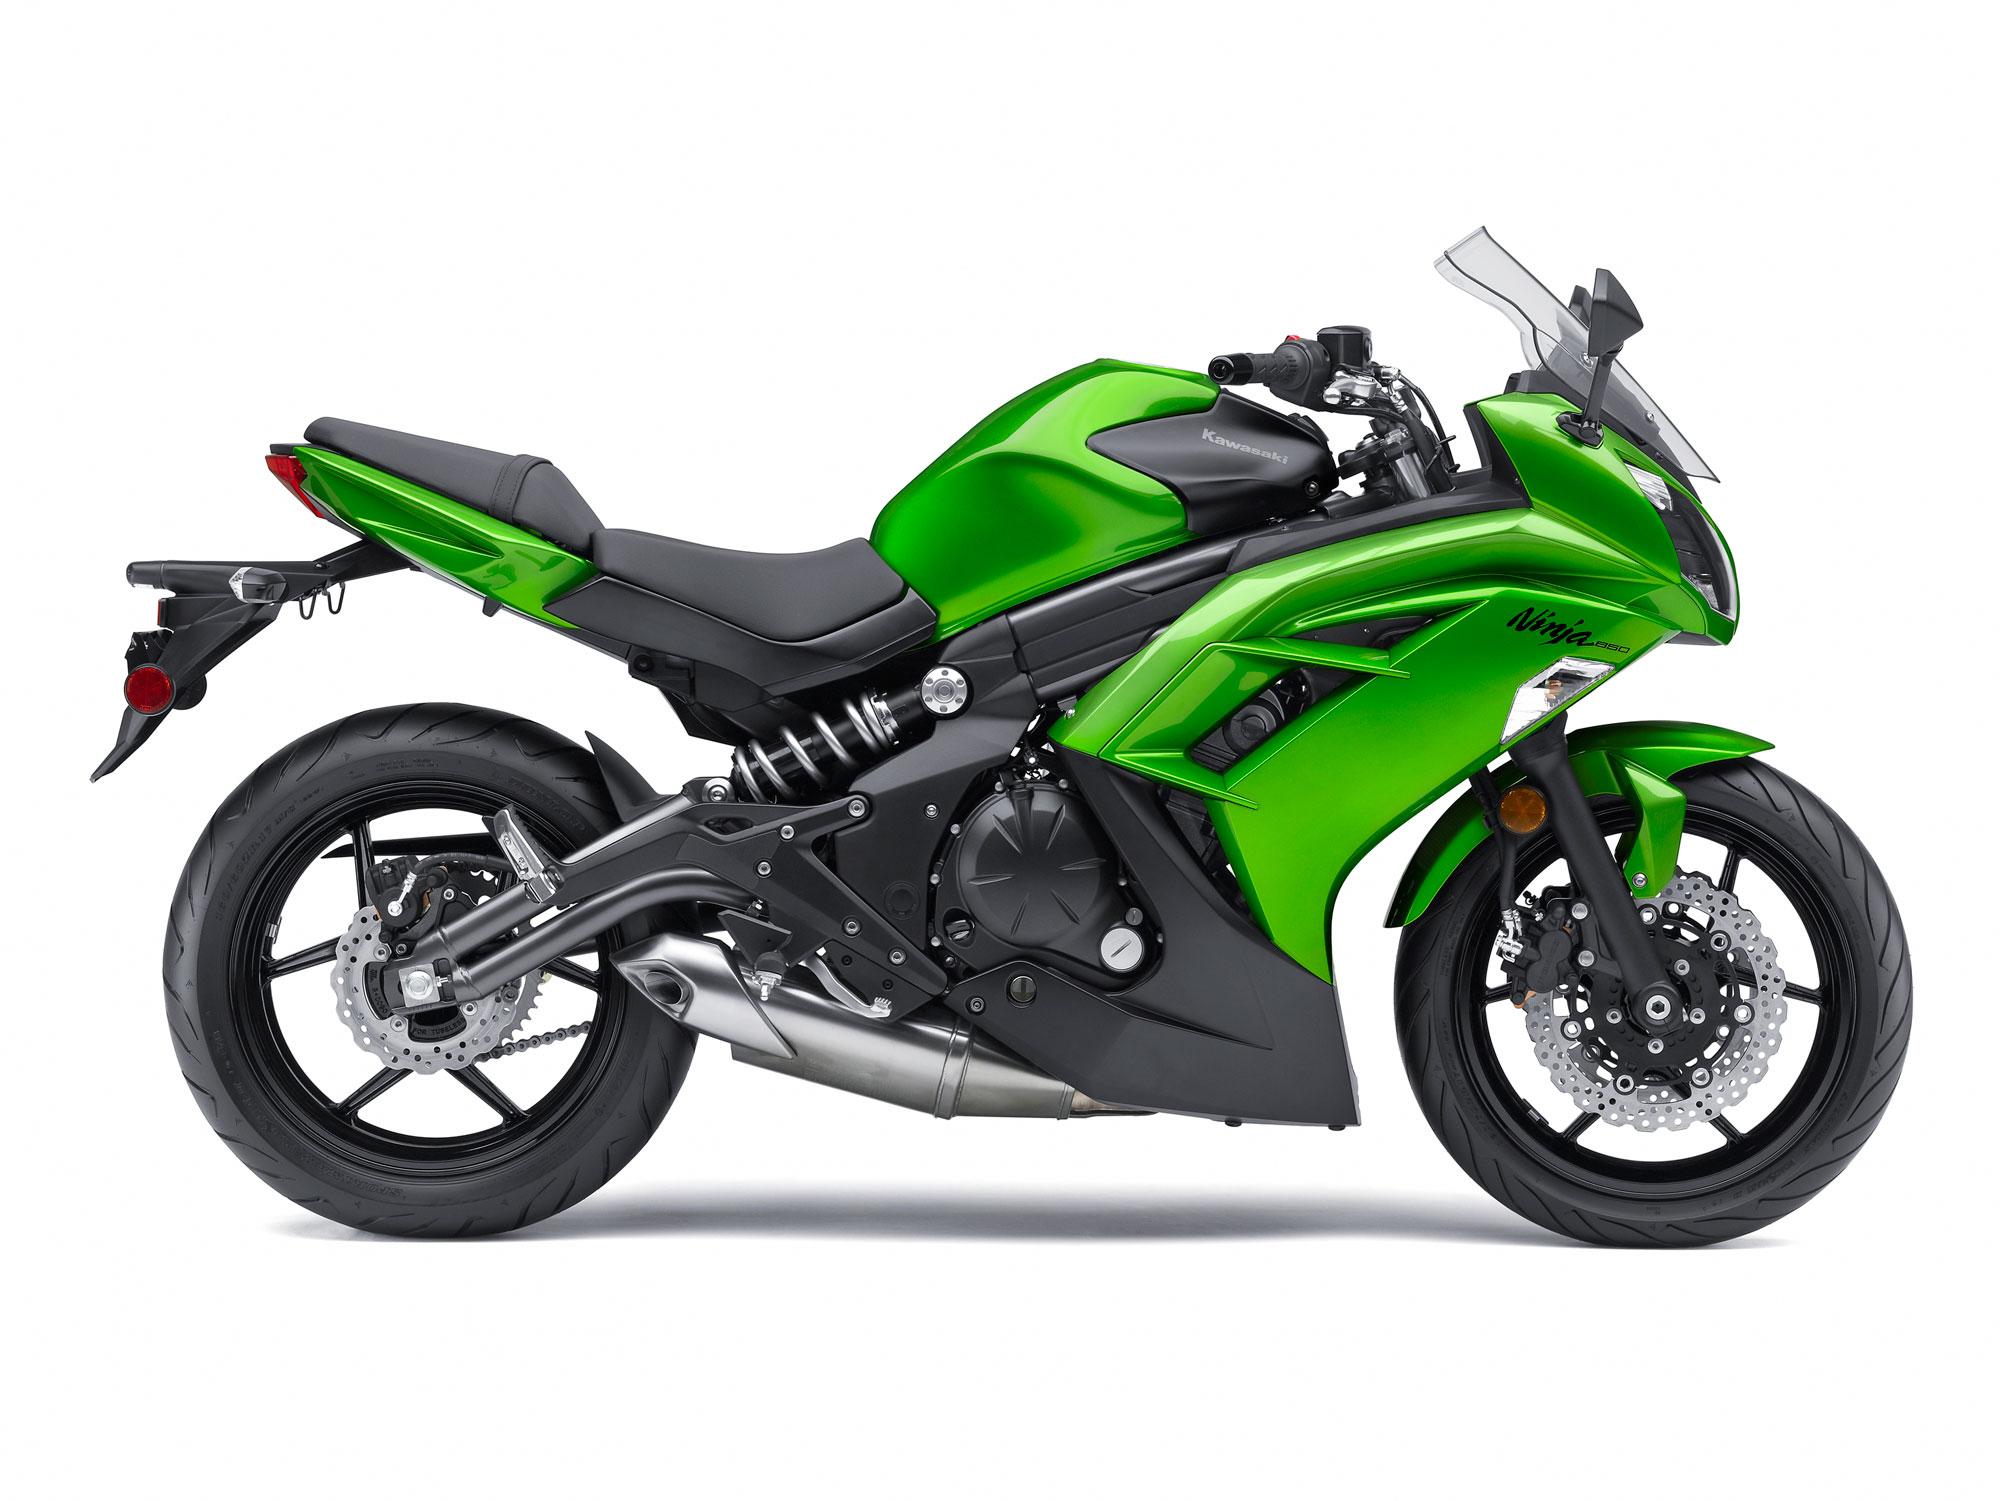 Kawasaki Ninja 650R 2013 (6)